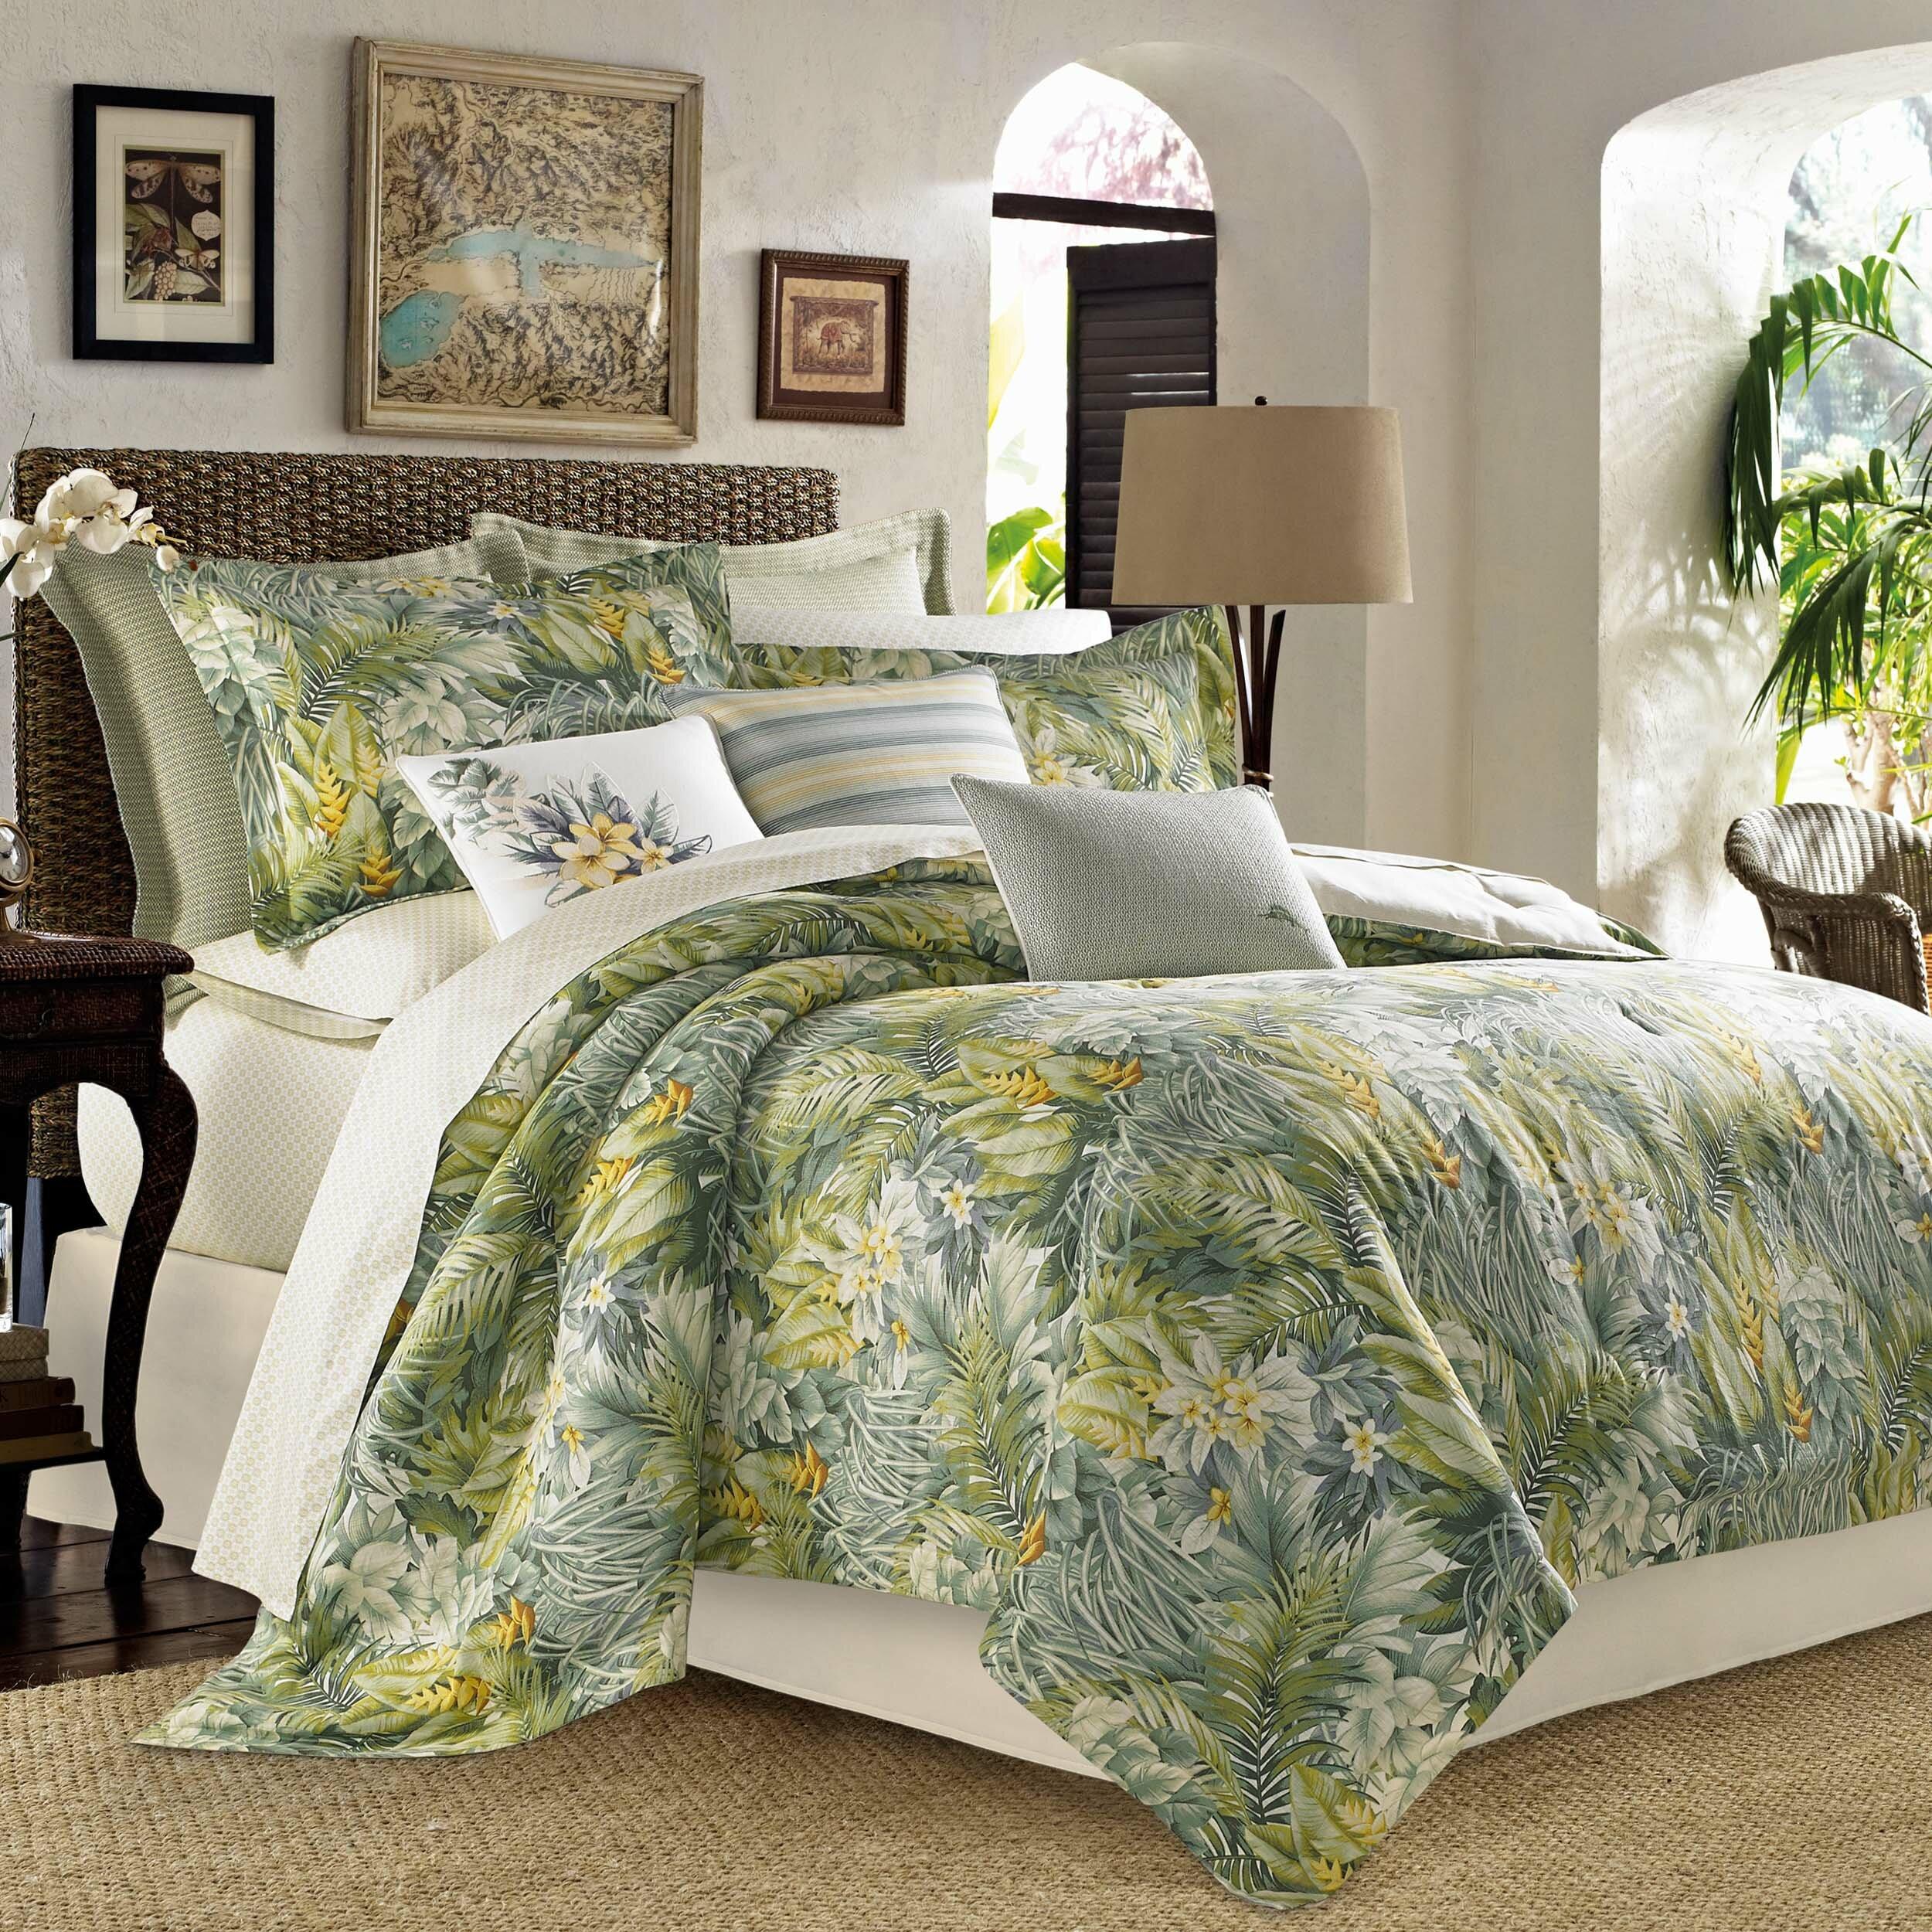 Tommy Bahama Bedding Cuba Cabana Comforter Collection